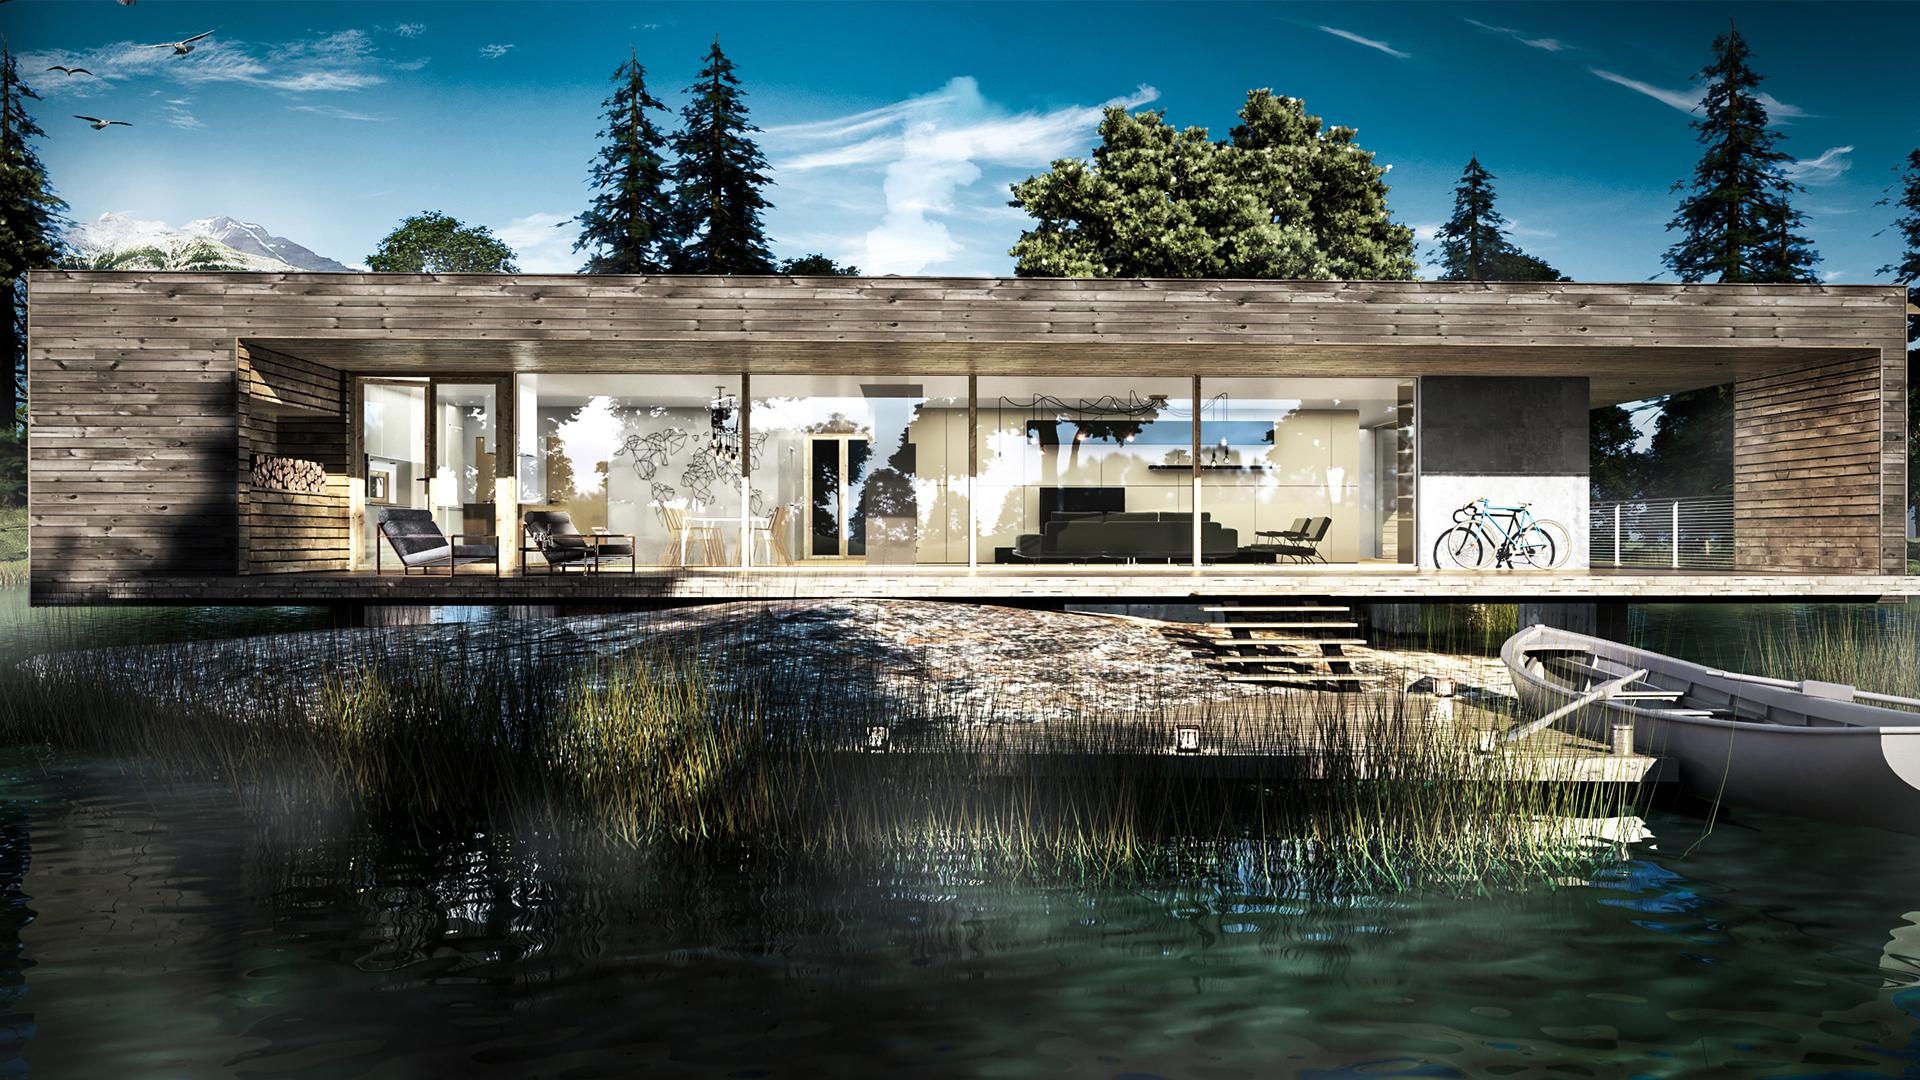 1920x1080 altlik Lake House 150 Dpi